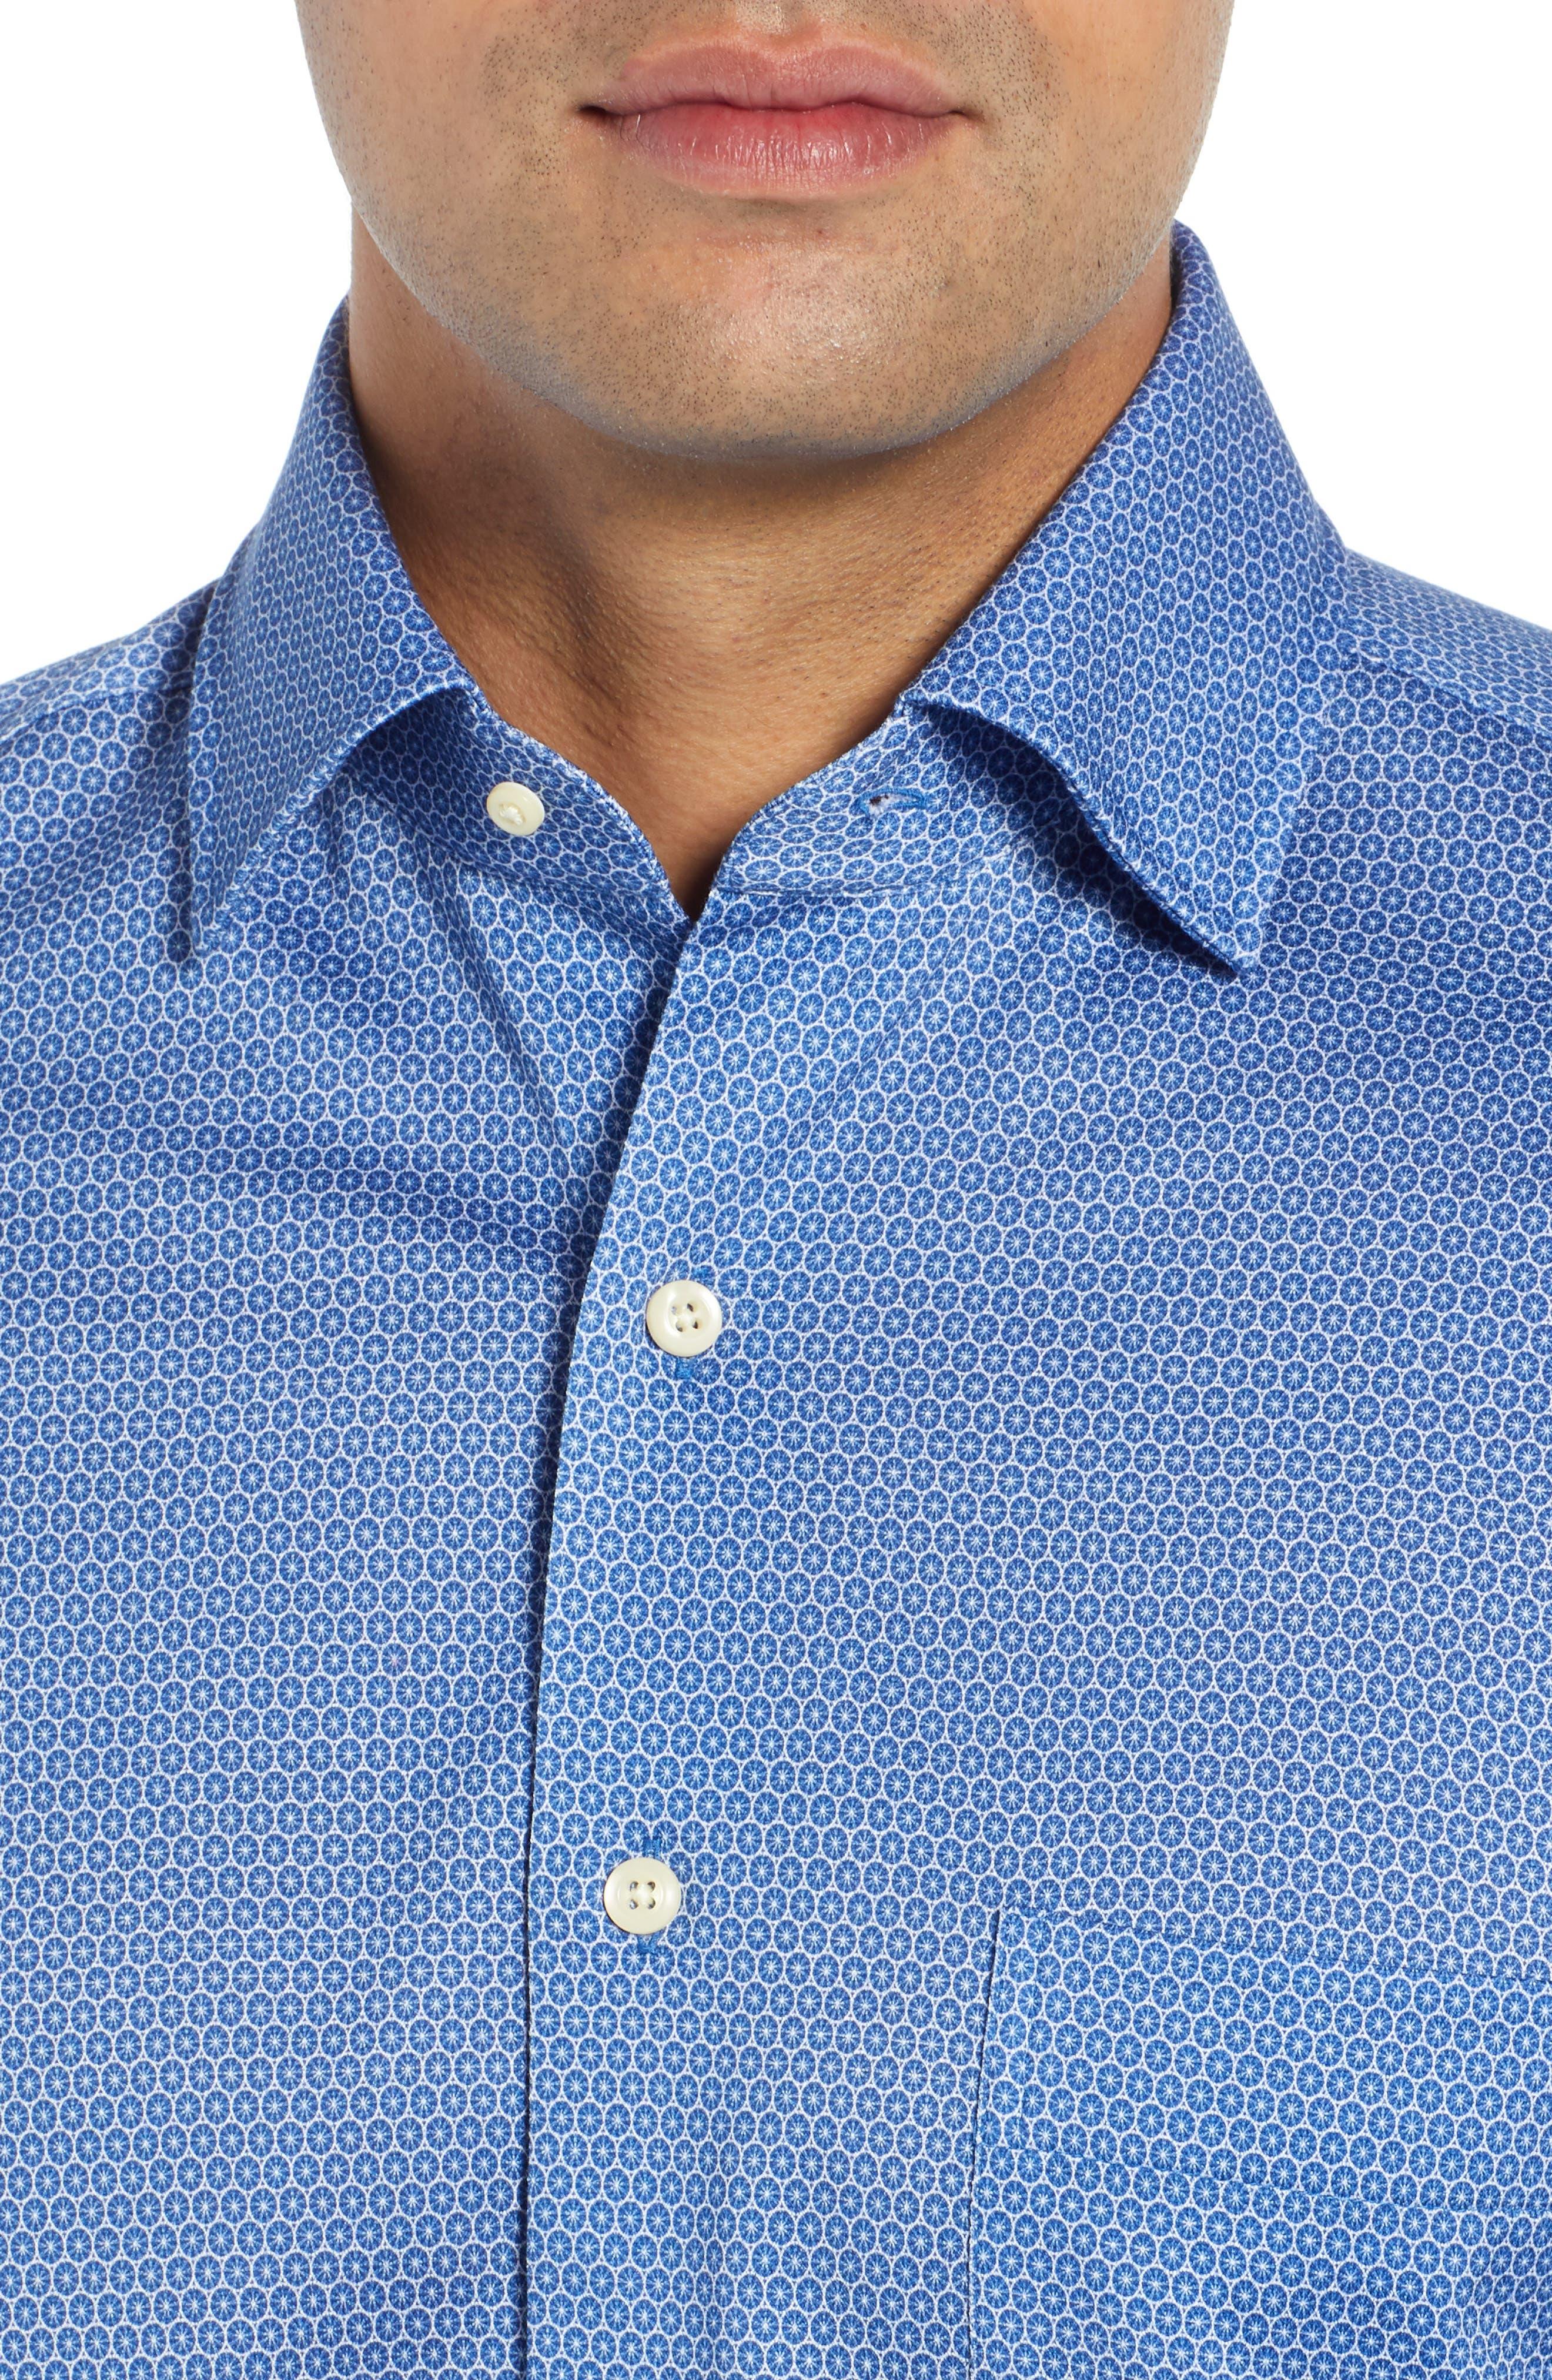 Schwinn Sport Shirt,                             Alternate thumbnail 2, color,                             PLAZA BLUE